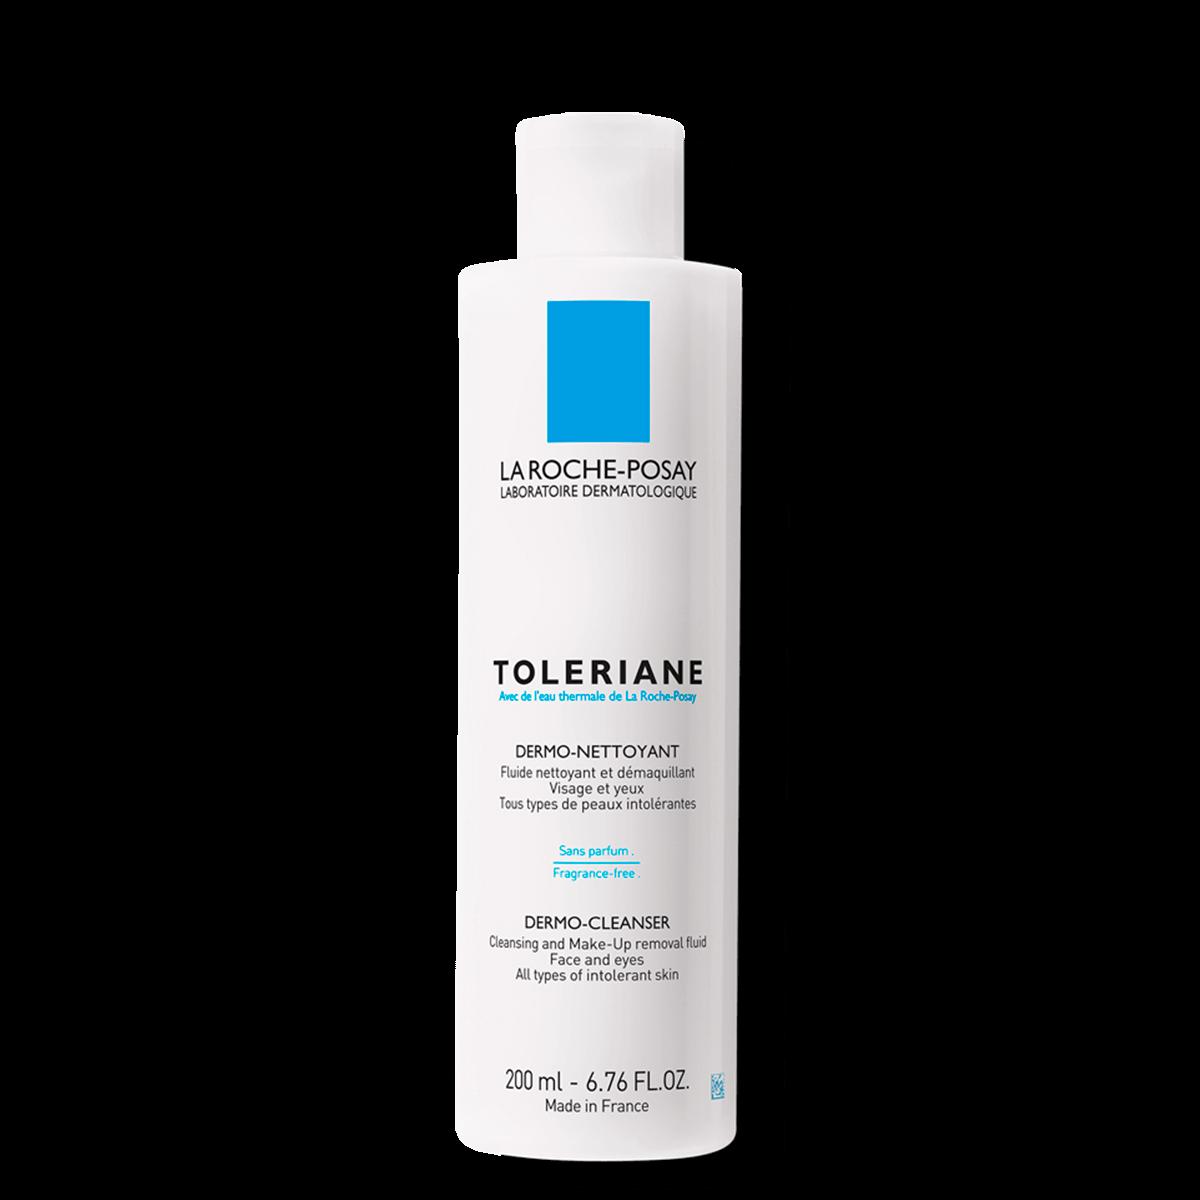 La Roche Posay Produktsida Känslig Allergisk Toleriane Dermo Cleanser